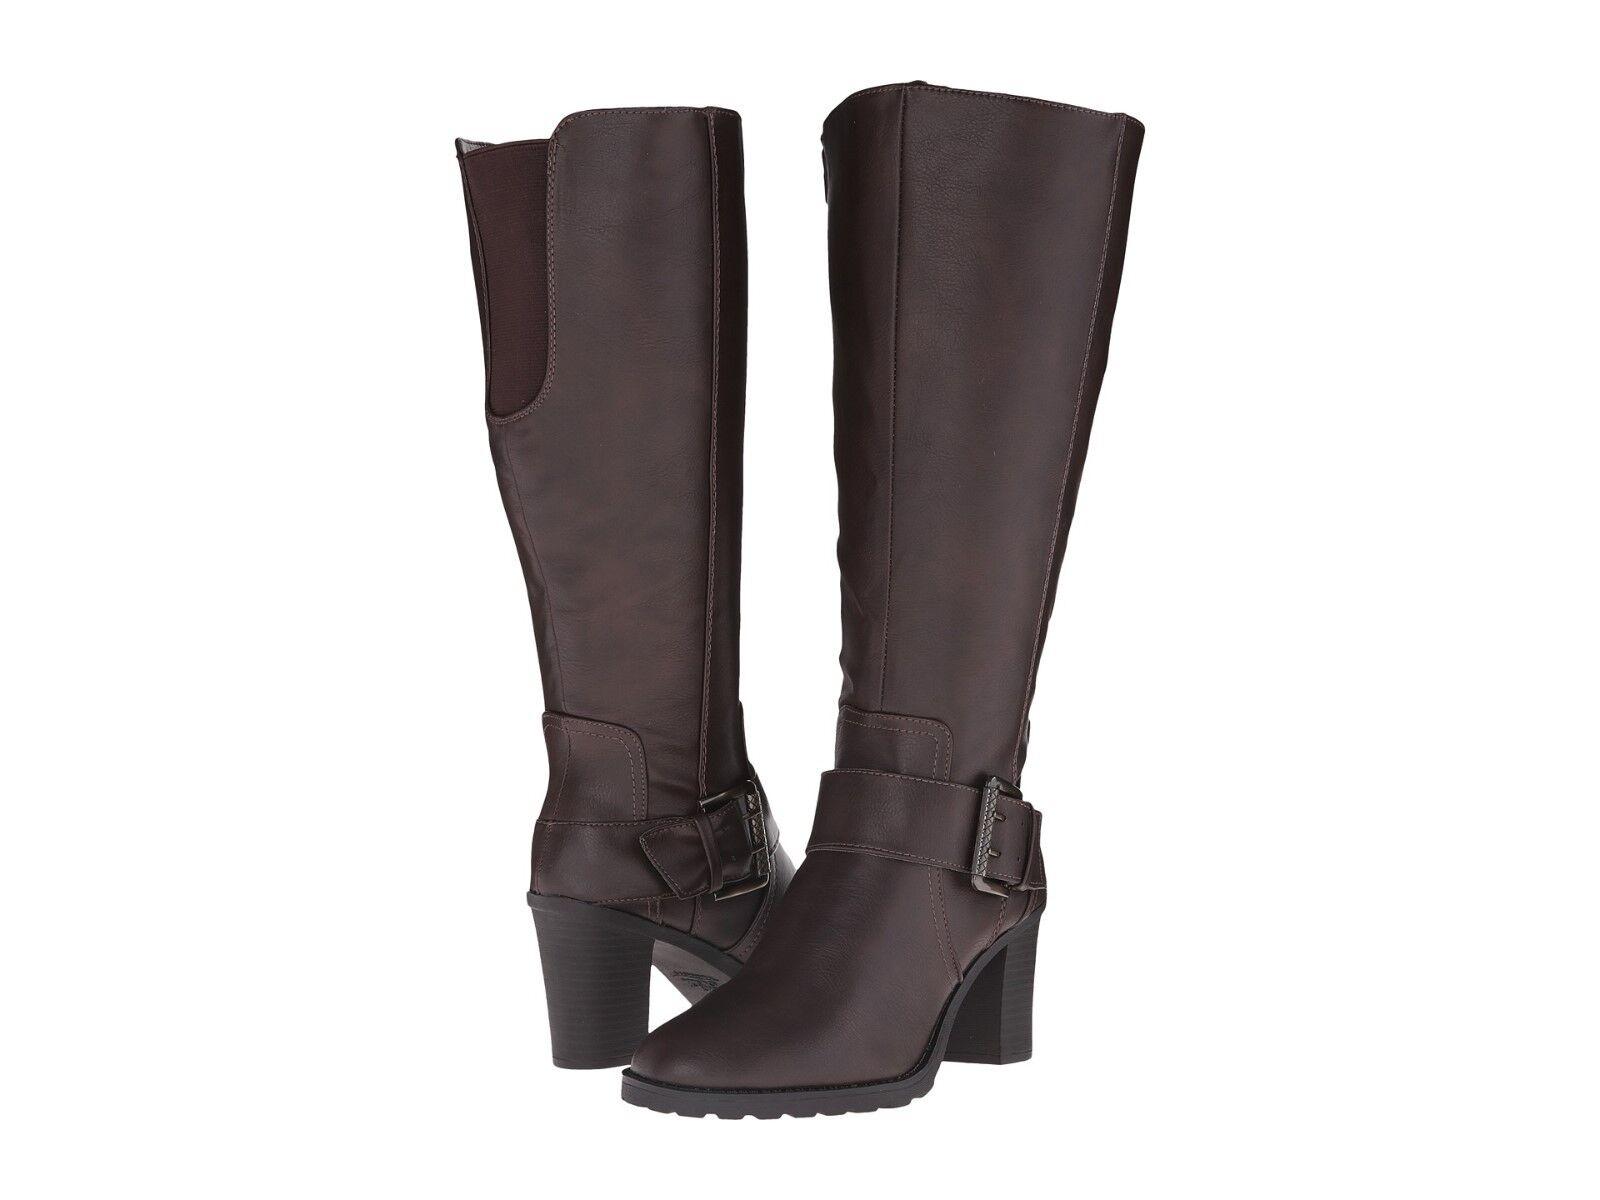 New LIFESTRIDE Sasha Dark braun Knee Knee Knee High Riding Stiefel 5.5 377c89